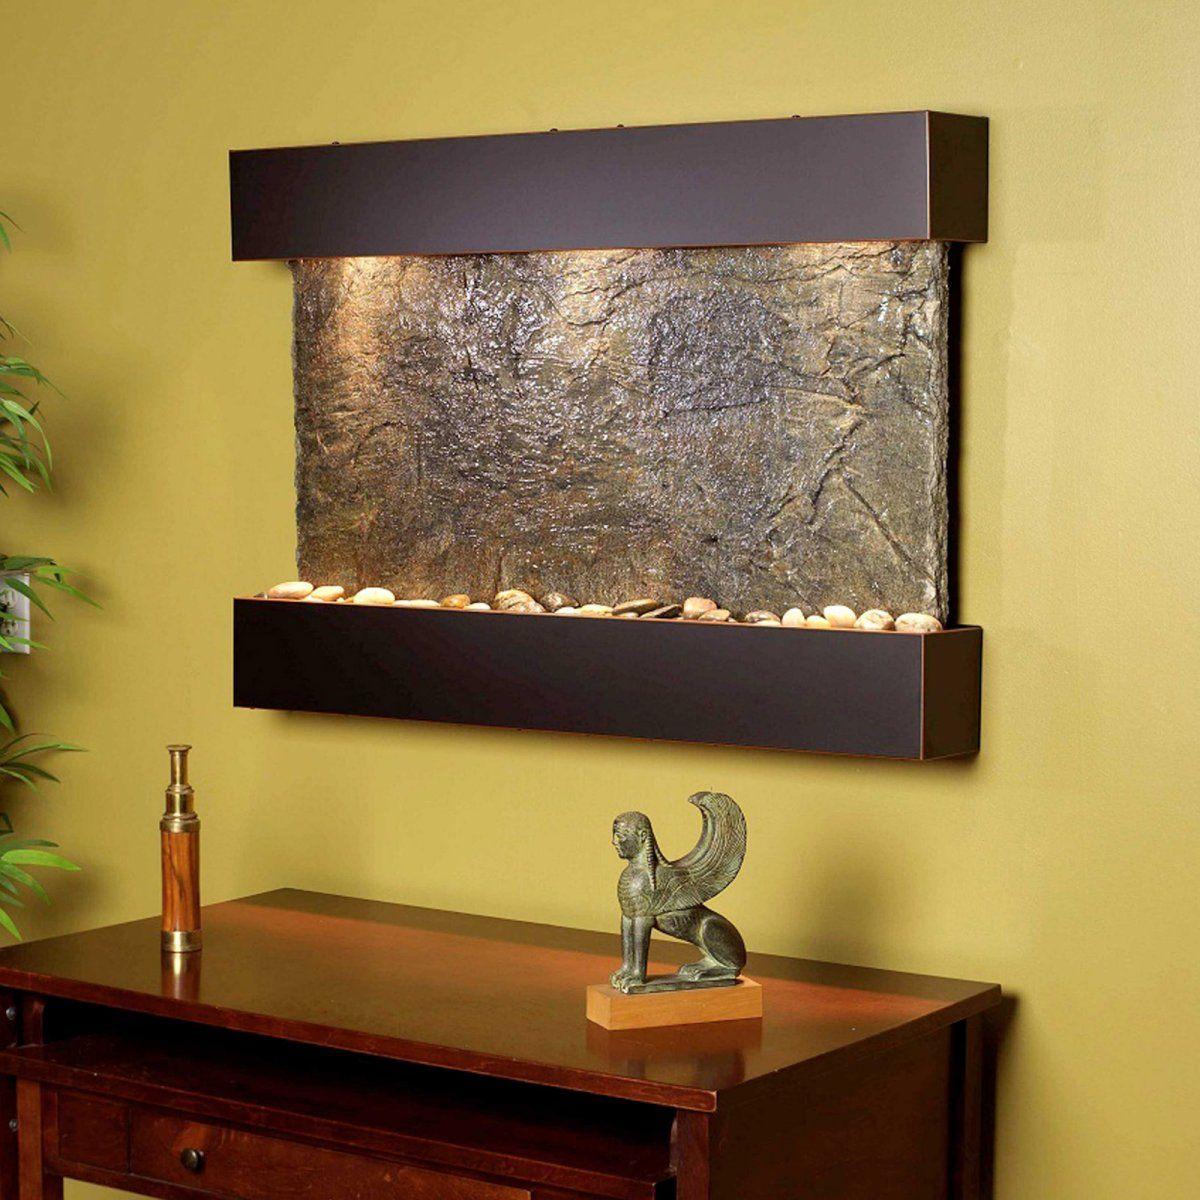 Adagio Reflection Creek Wall Fountain - Indoor Wall Fountains at ...